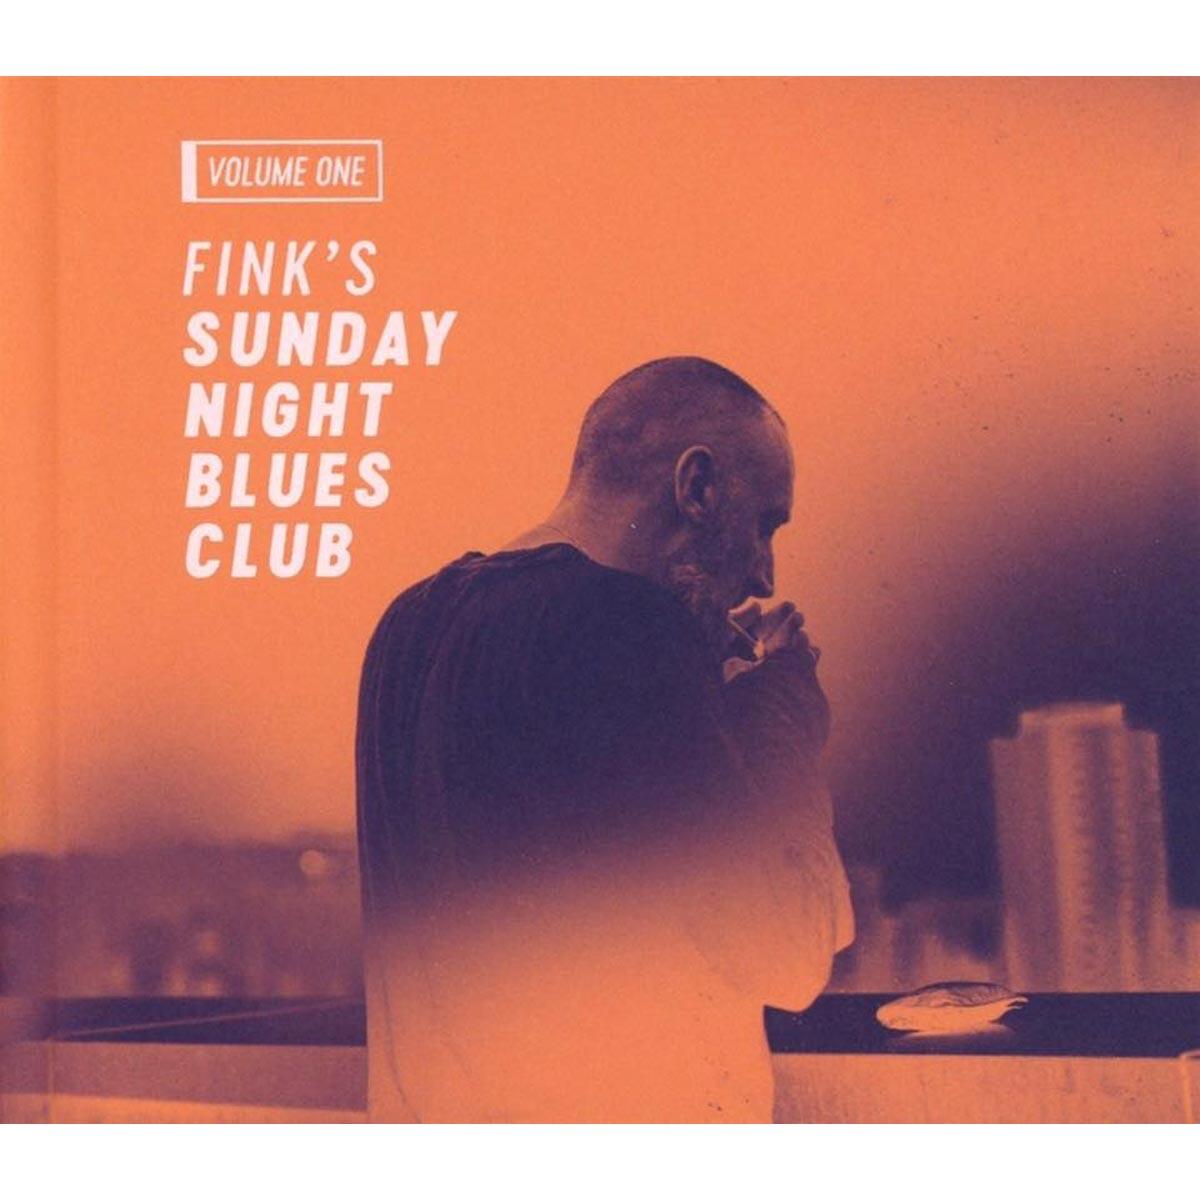 FINK - Fink's Sunday Night Blues Club